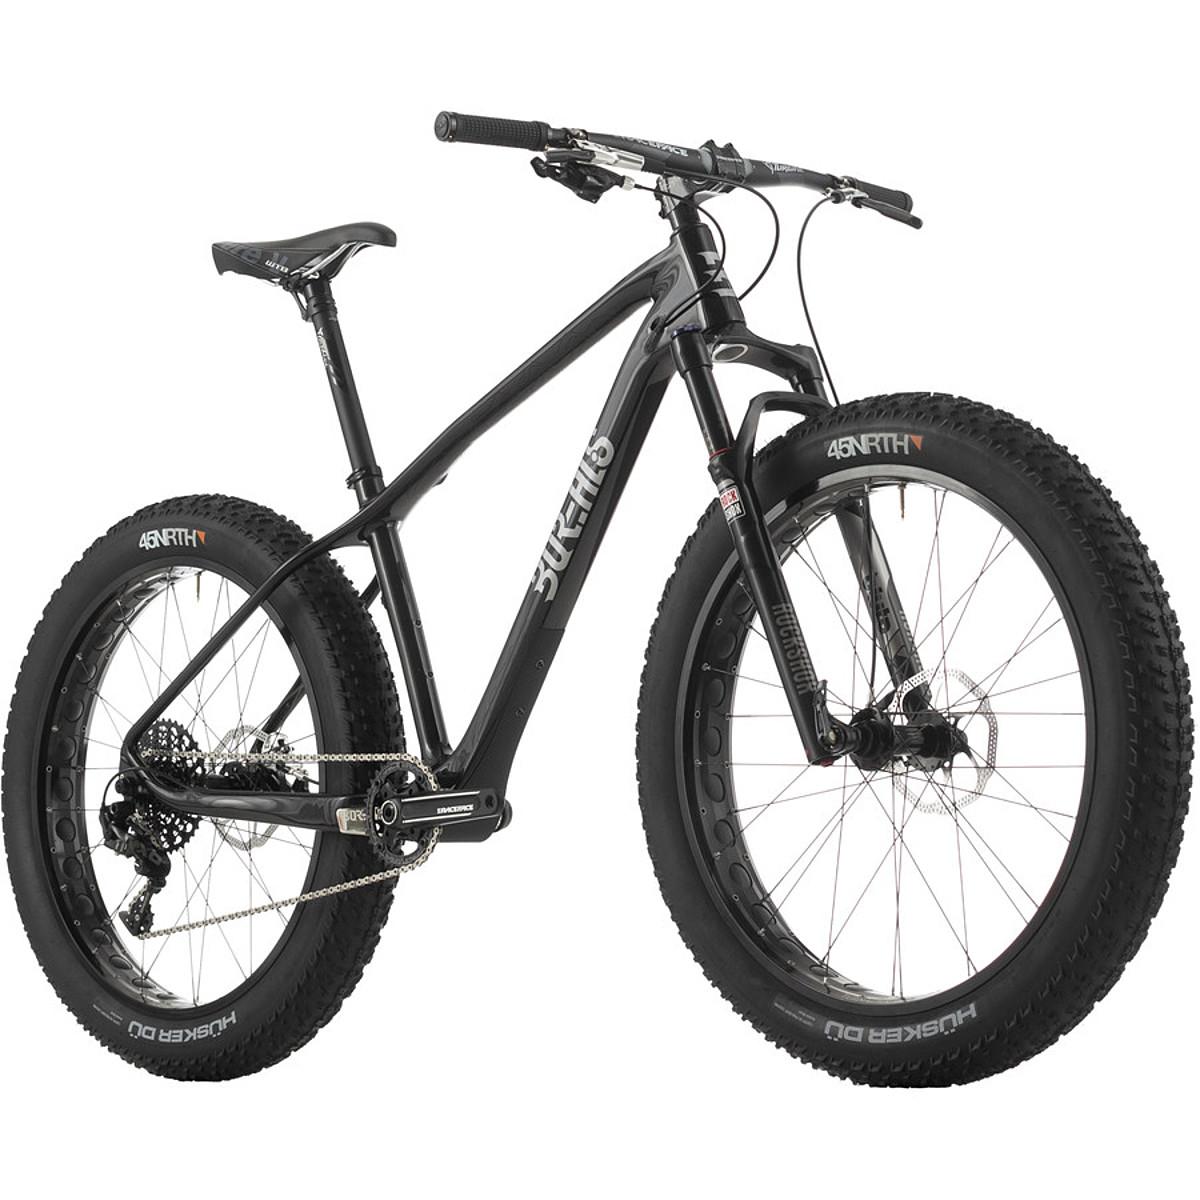 Borealis Bikes Echo X01 Complete Fat 2016 Black